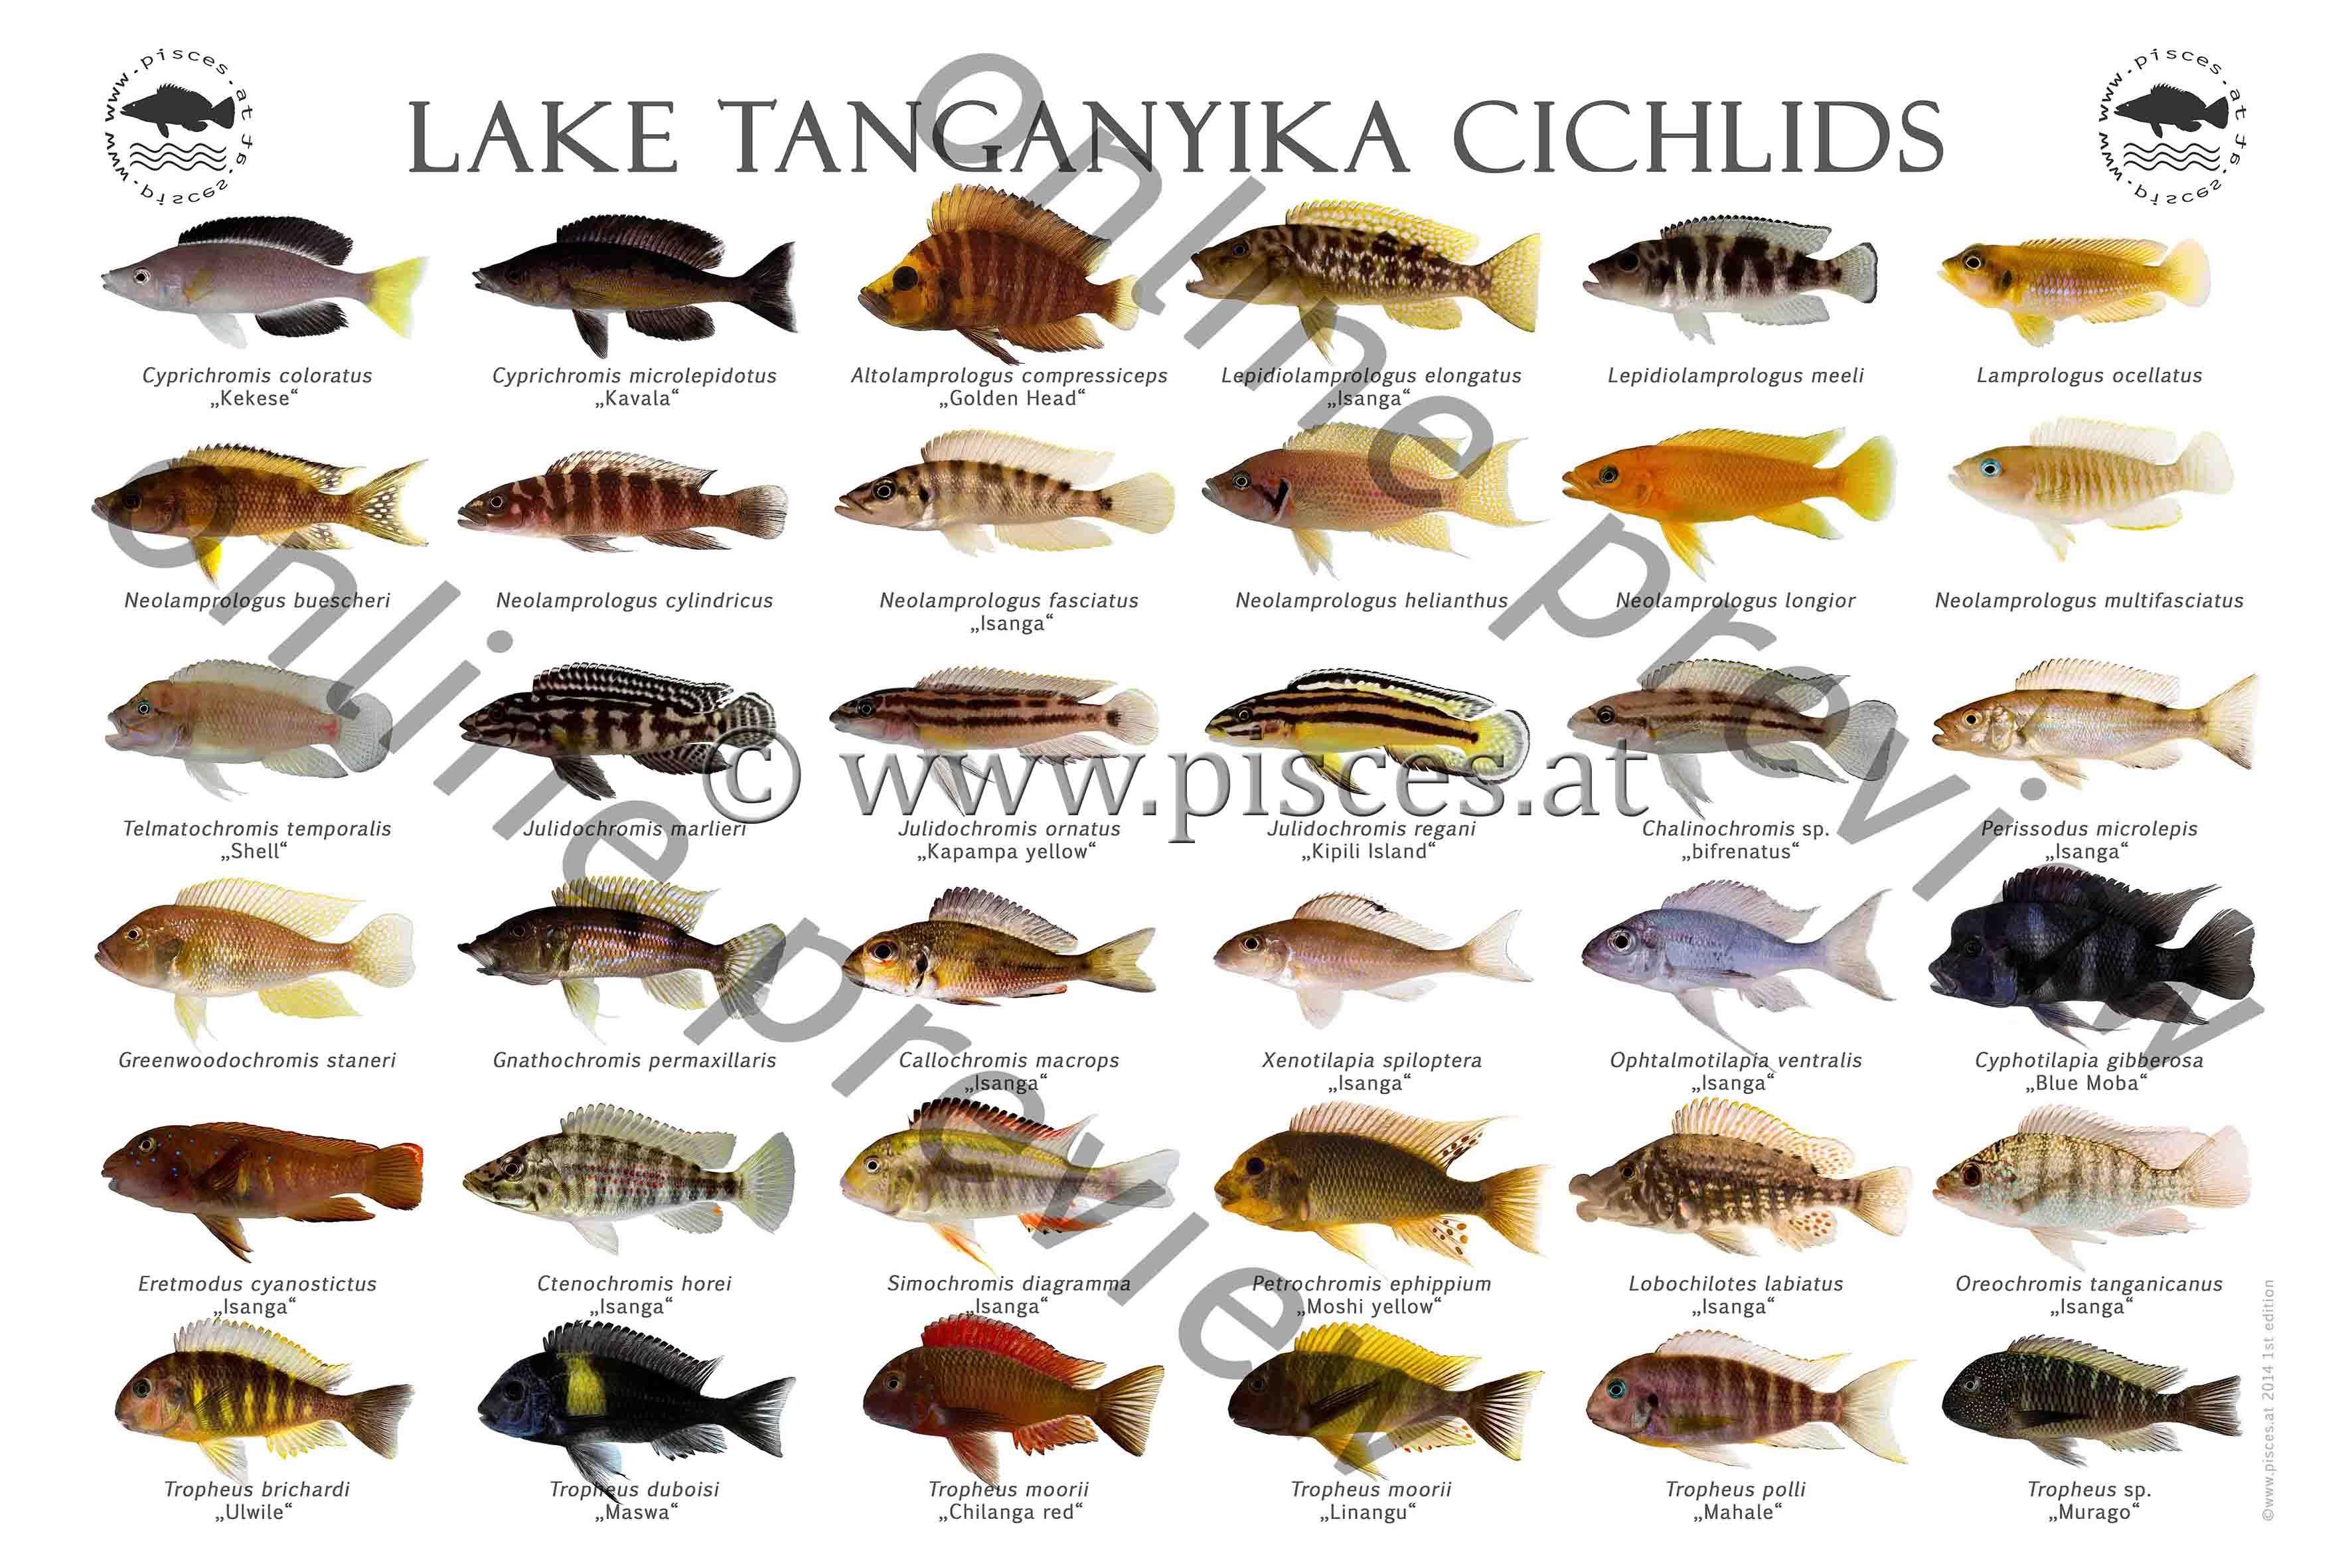 Lake Tanganyika Cichlids Jpg 3543 2362 Cichlids Lake Tanganyika Aquarium Fish